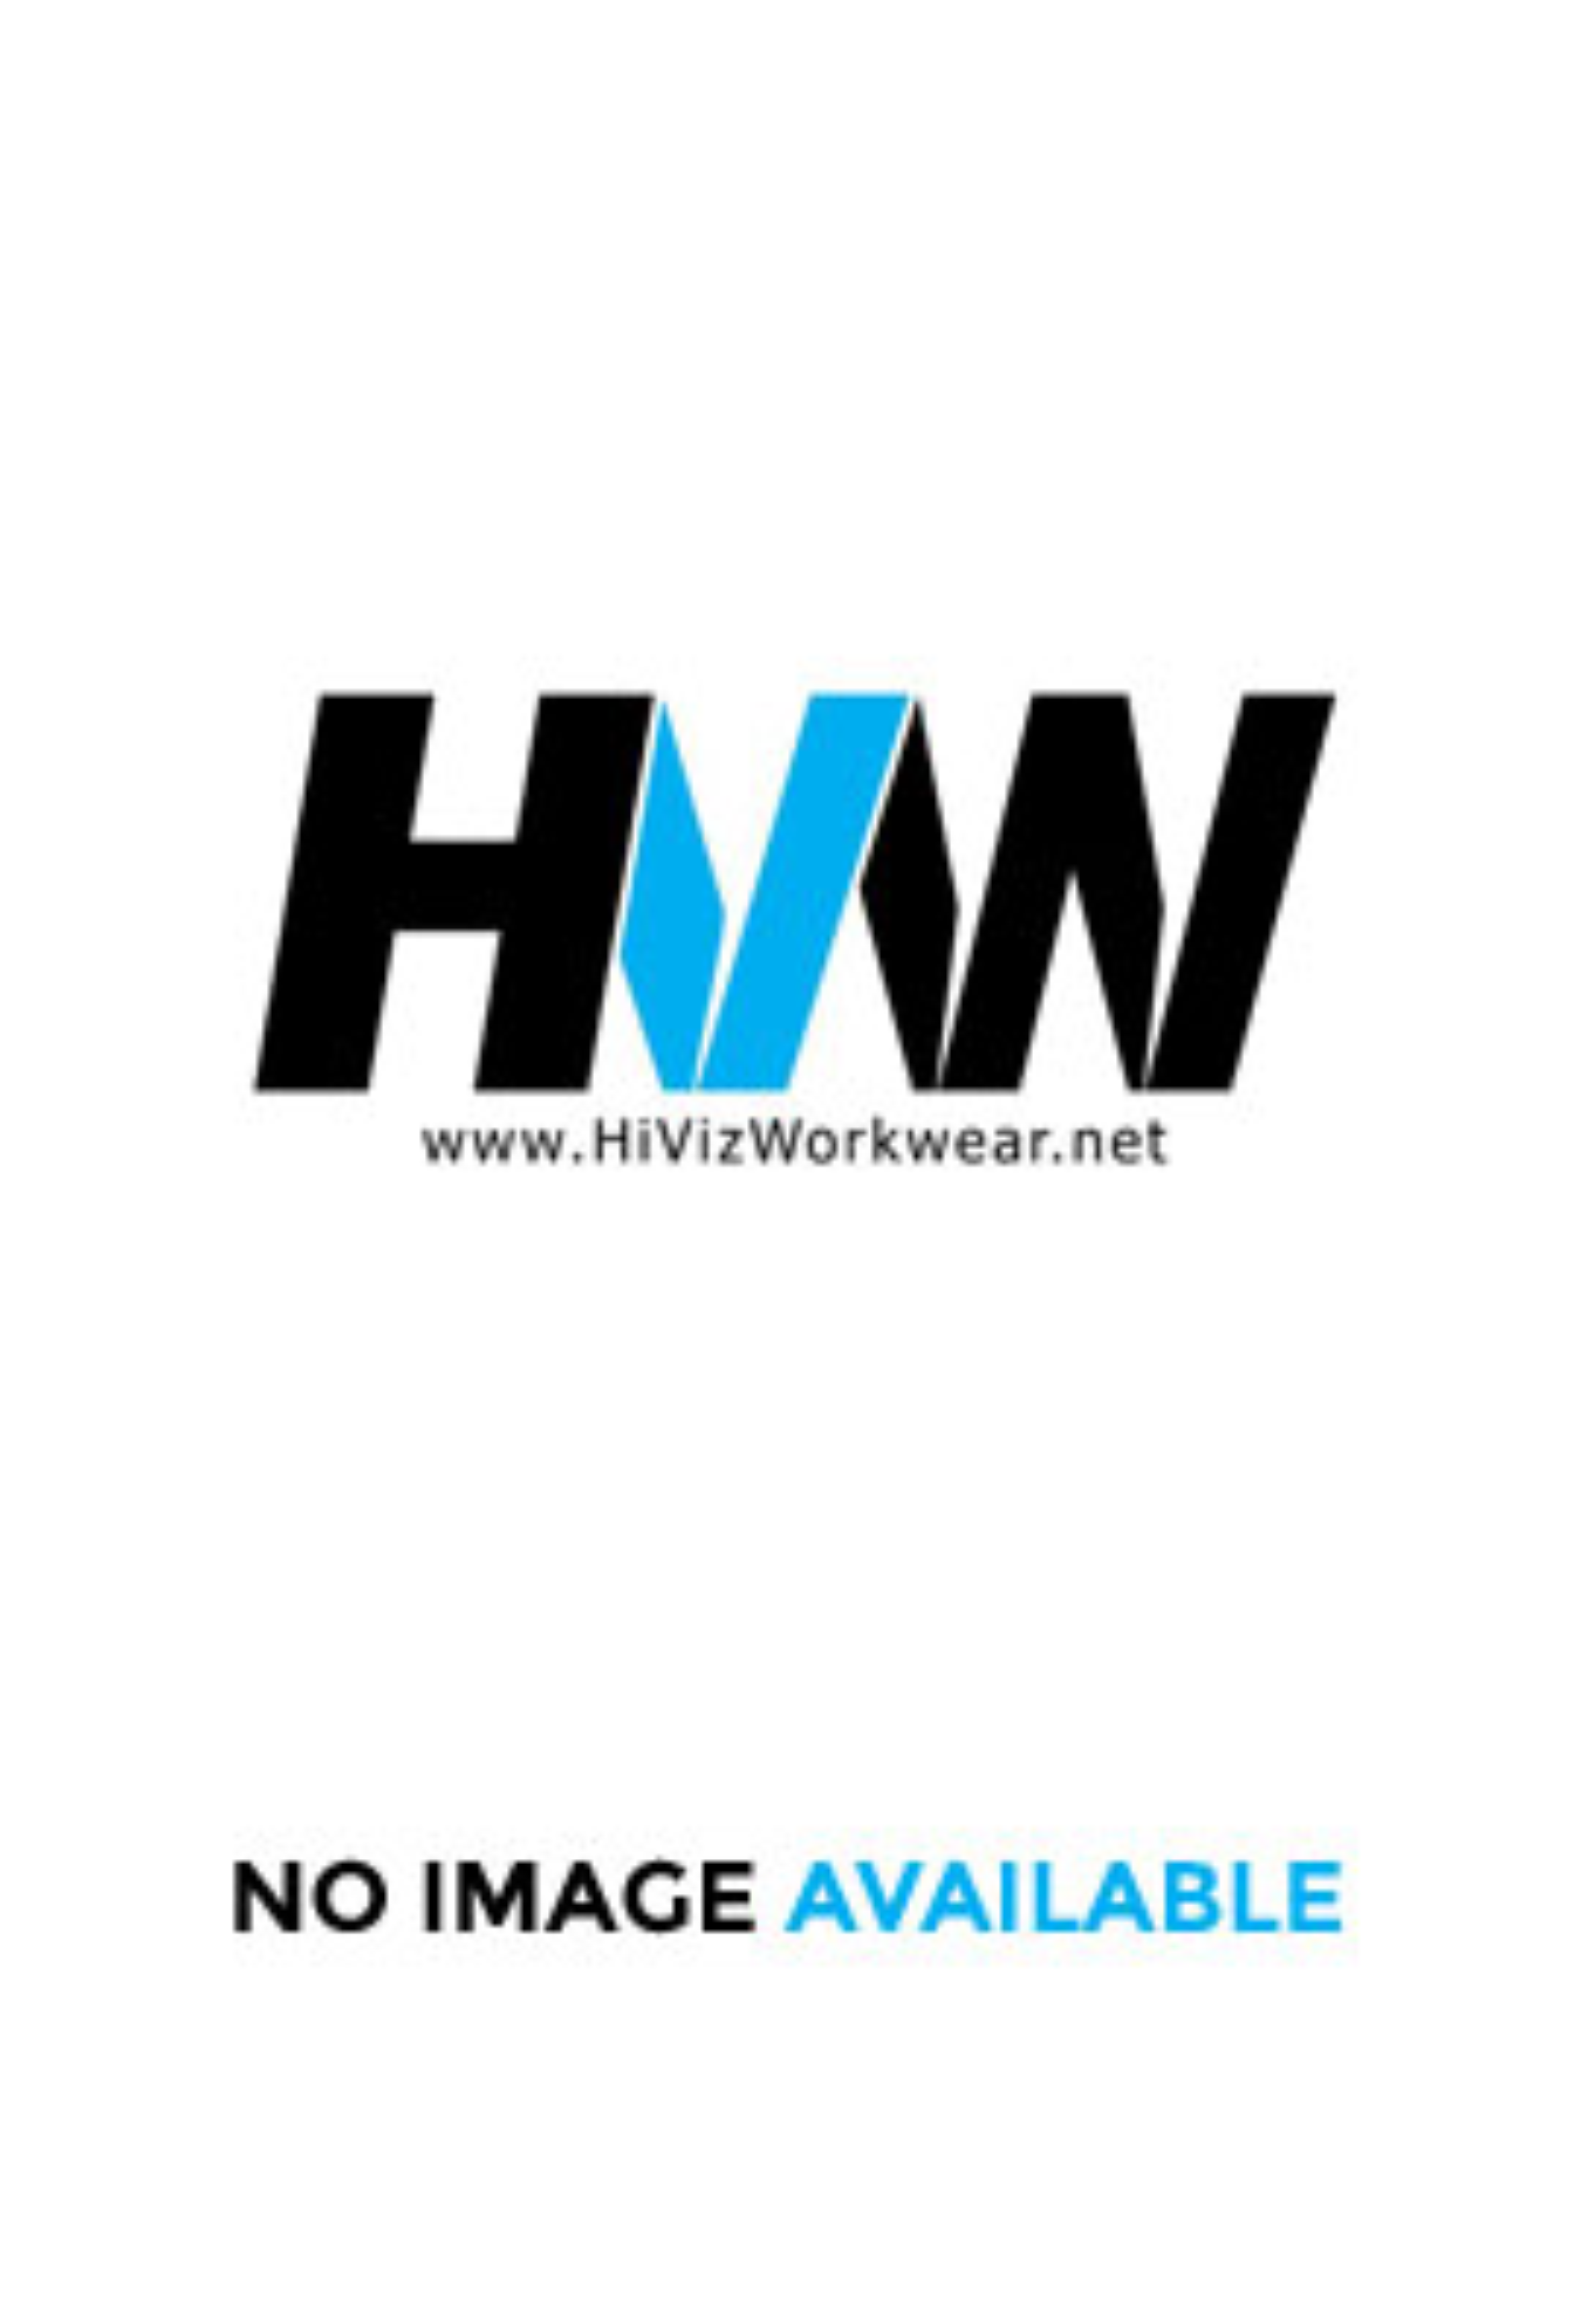 Russell J215M Classic HeavyWeight Ringspun T-shirt (Small To 2XL)